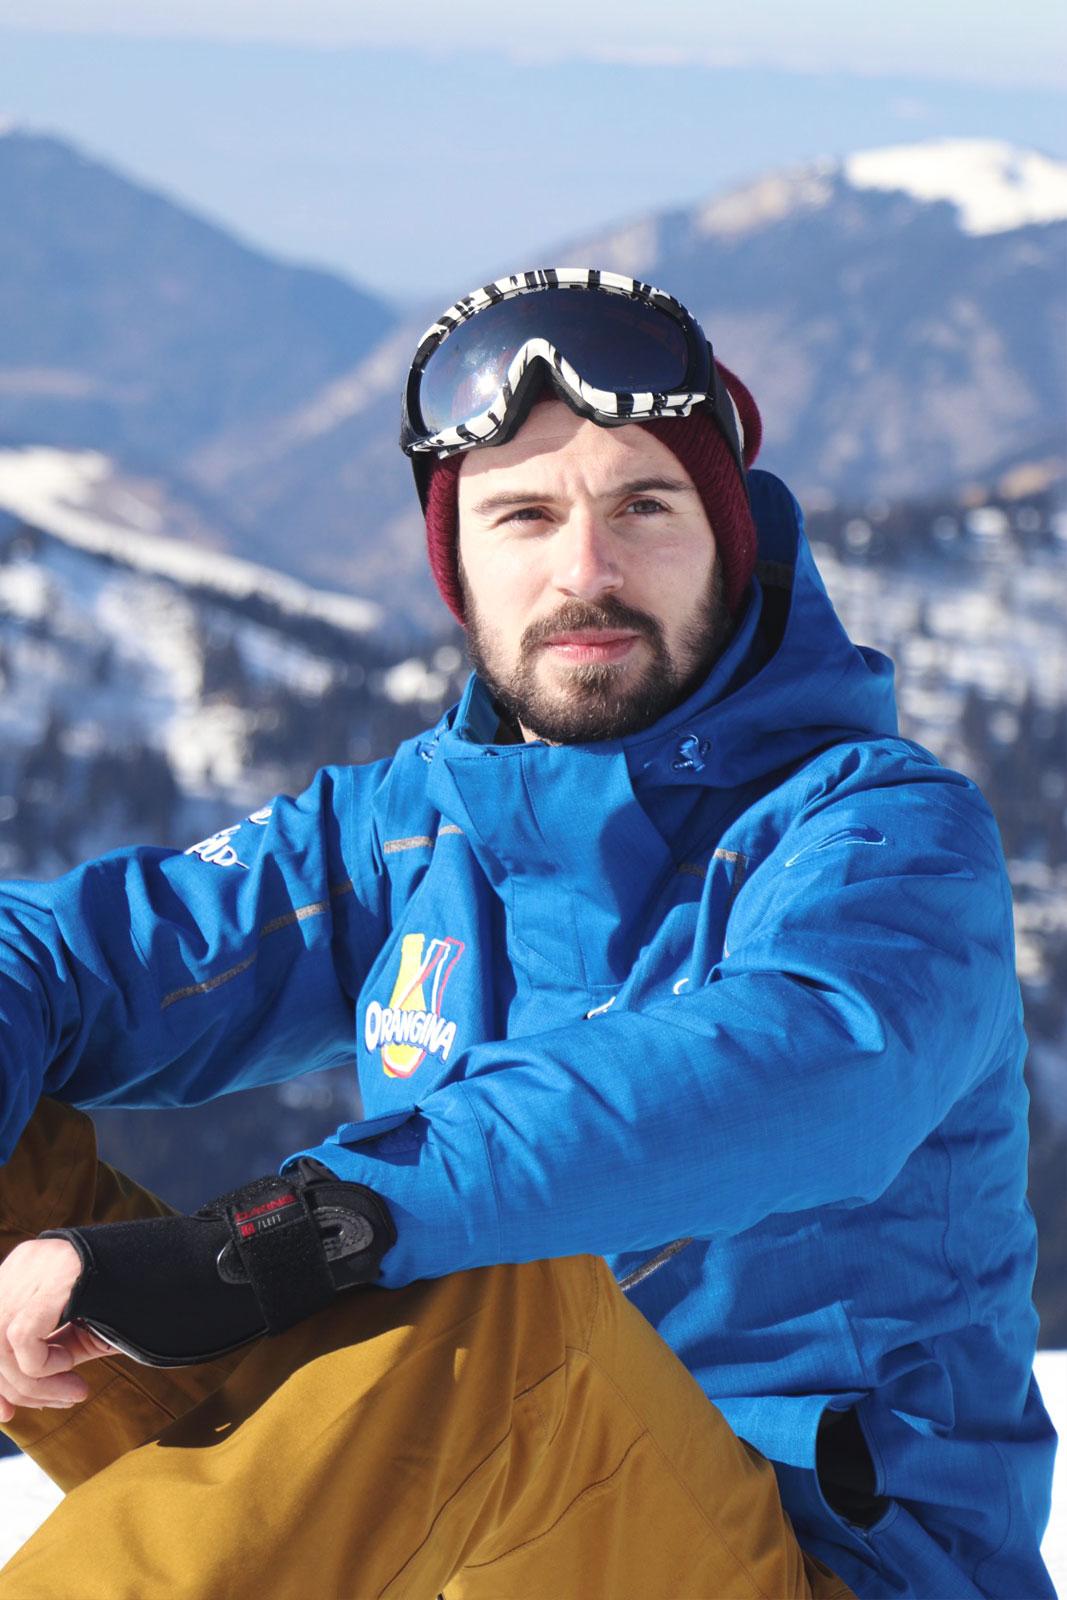 Tenue snowboard